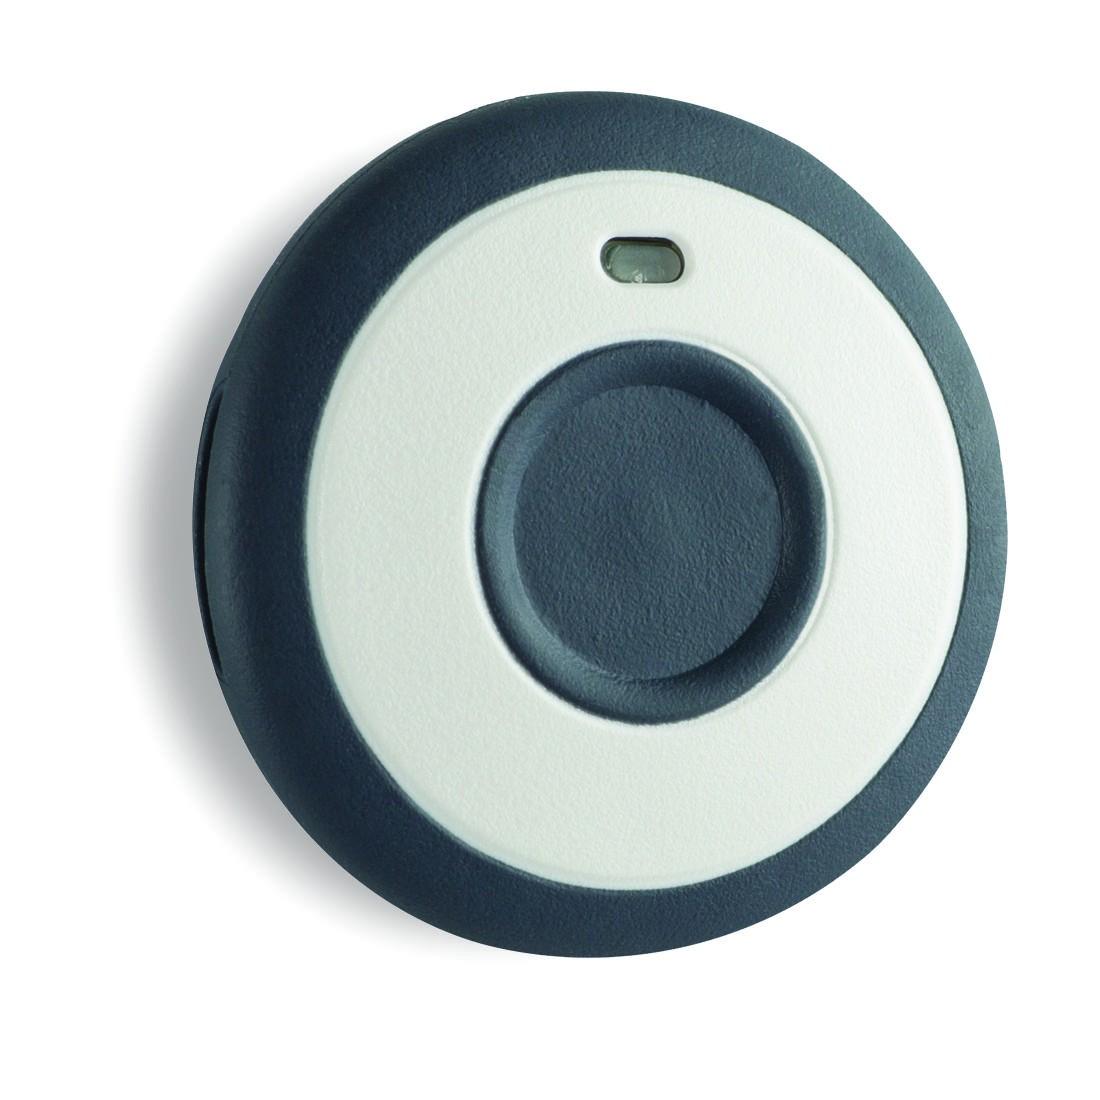 Honeywell evohome Security Panic Button TCPA1BS, bezdrátový nouzový alarm